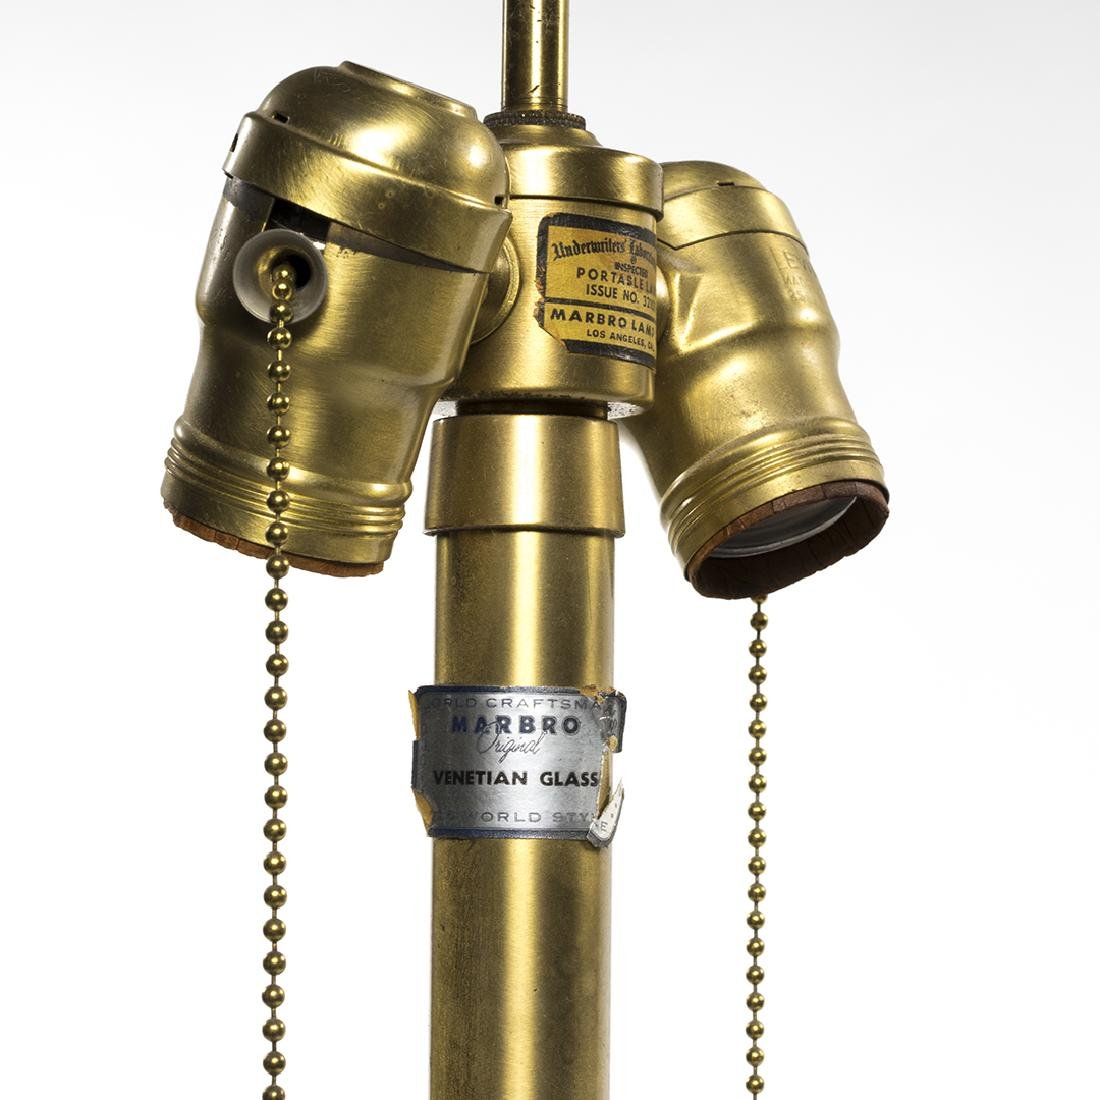 Murano Marbro Table Lamps (2) - 6